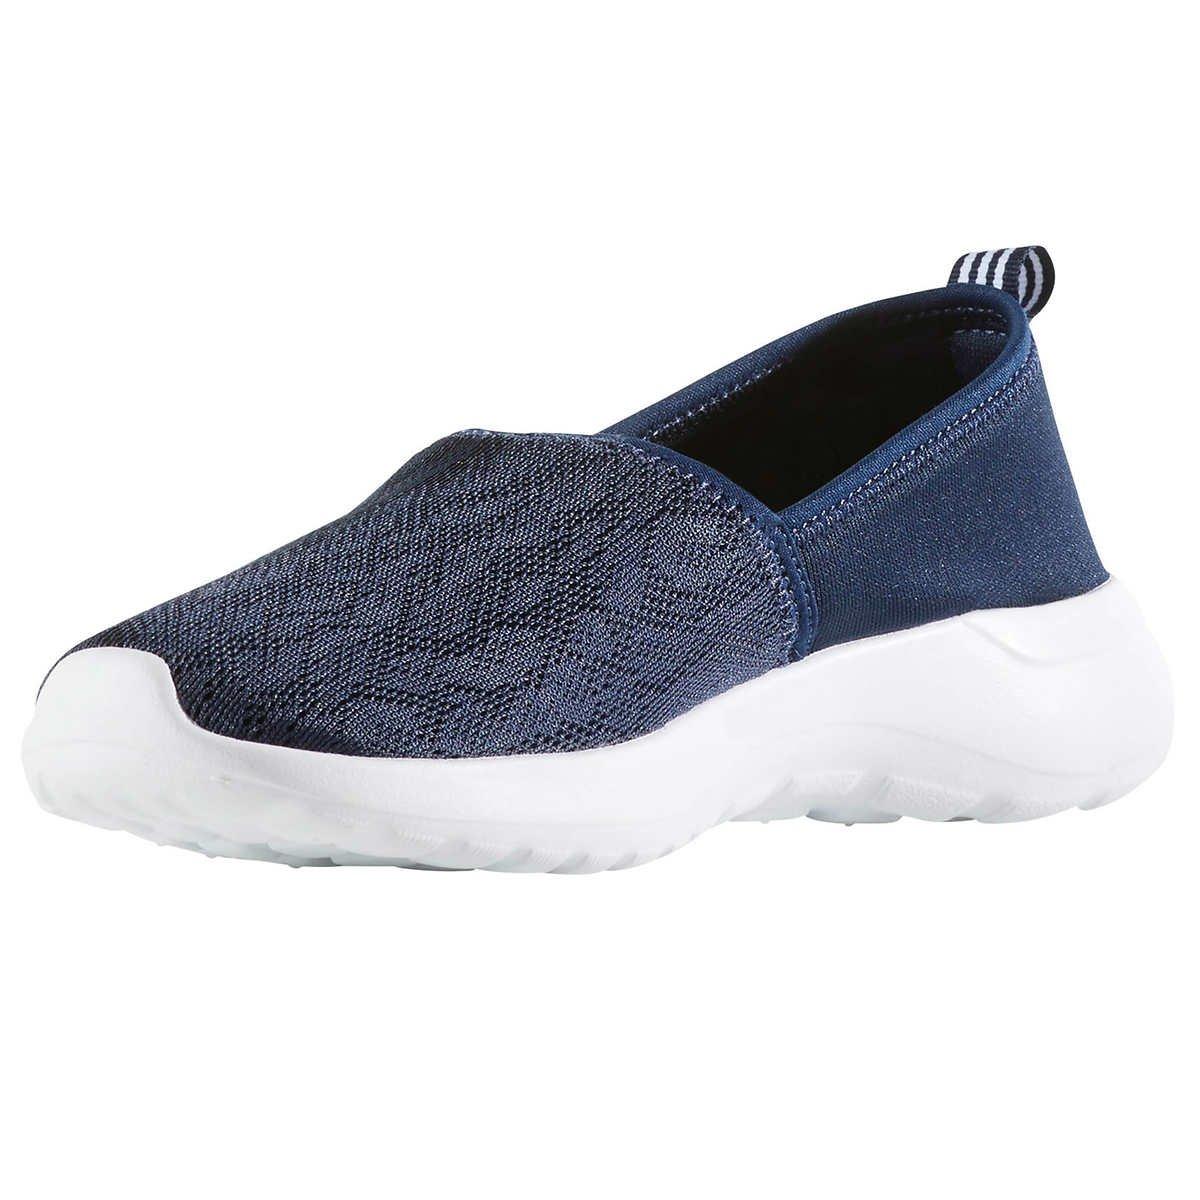 adidas Women Cloudfoam Lite Racer Slip On Shoes, Navy/White, 8.5 B(M) US